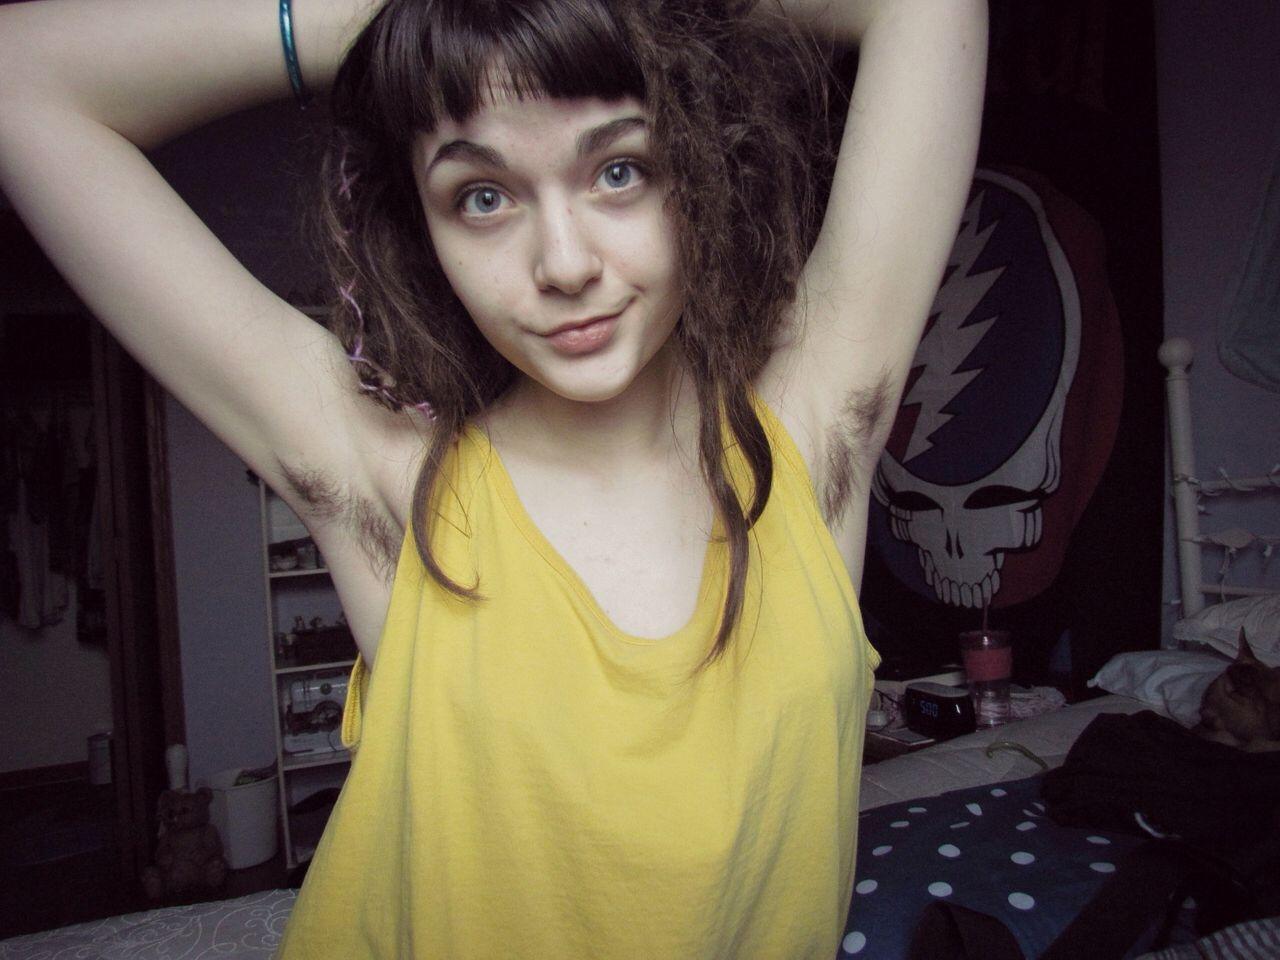 Hairy hippie girls nude